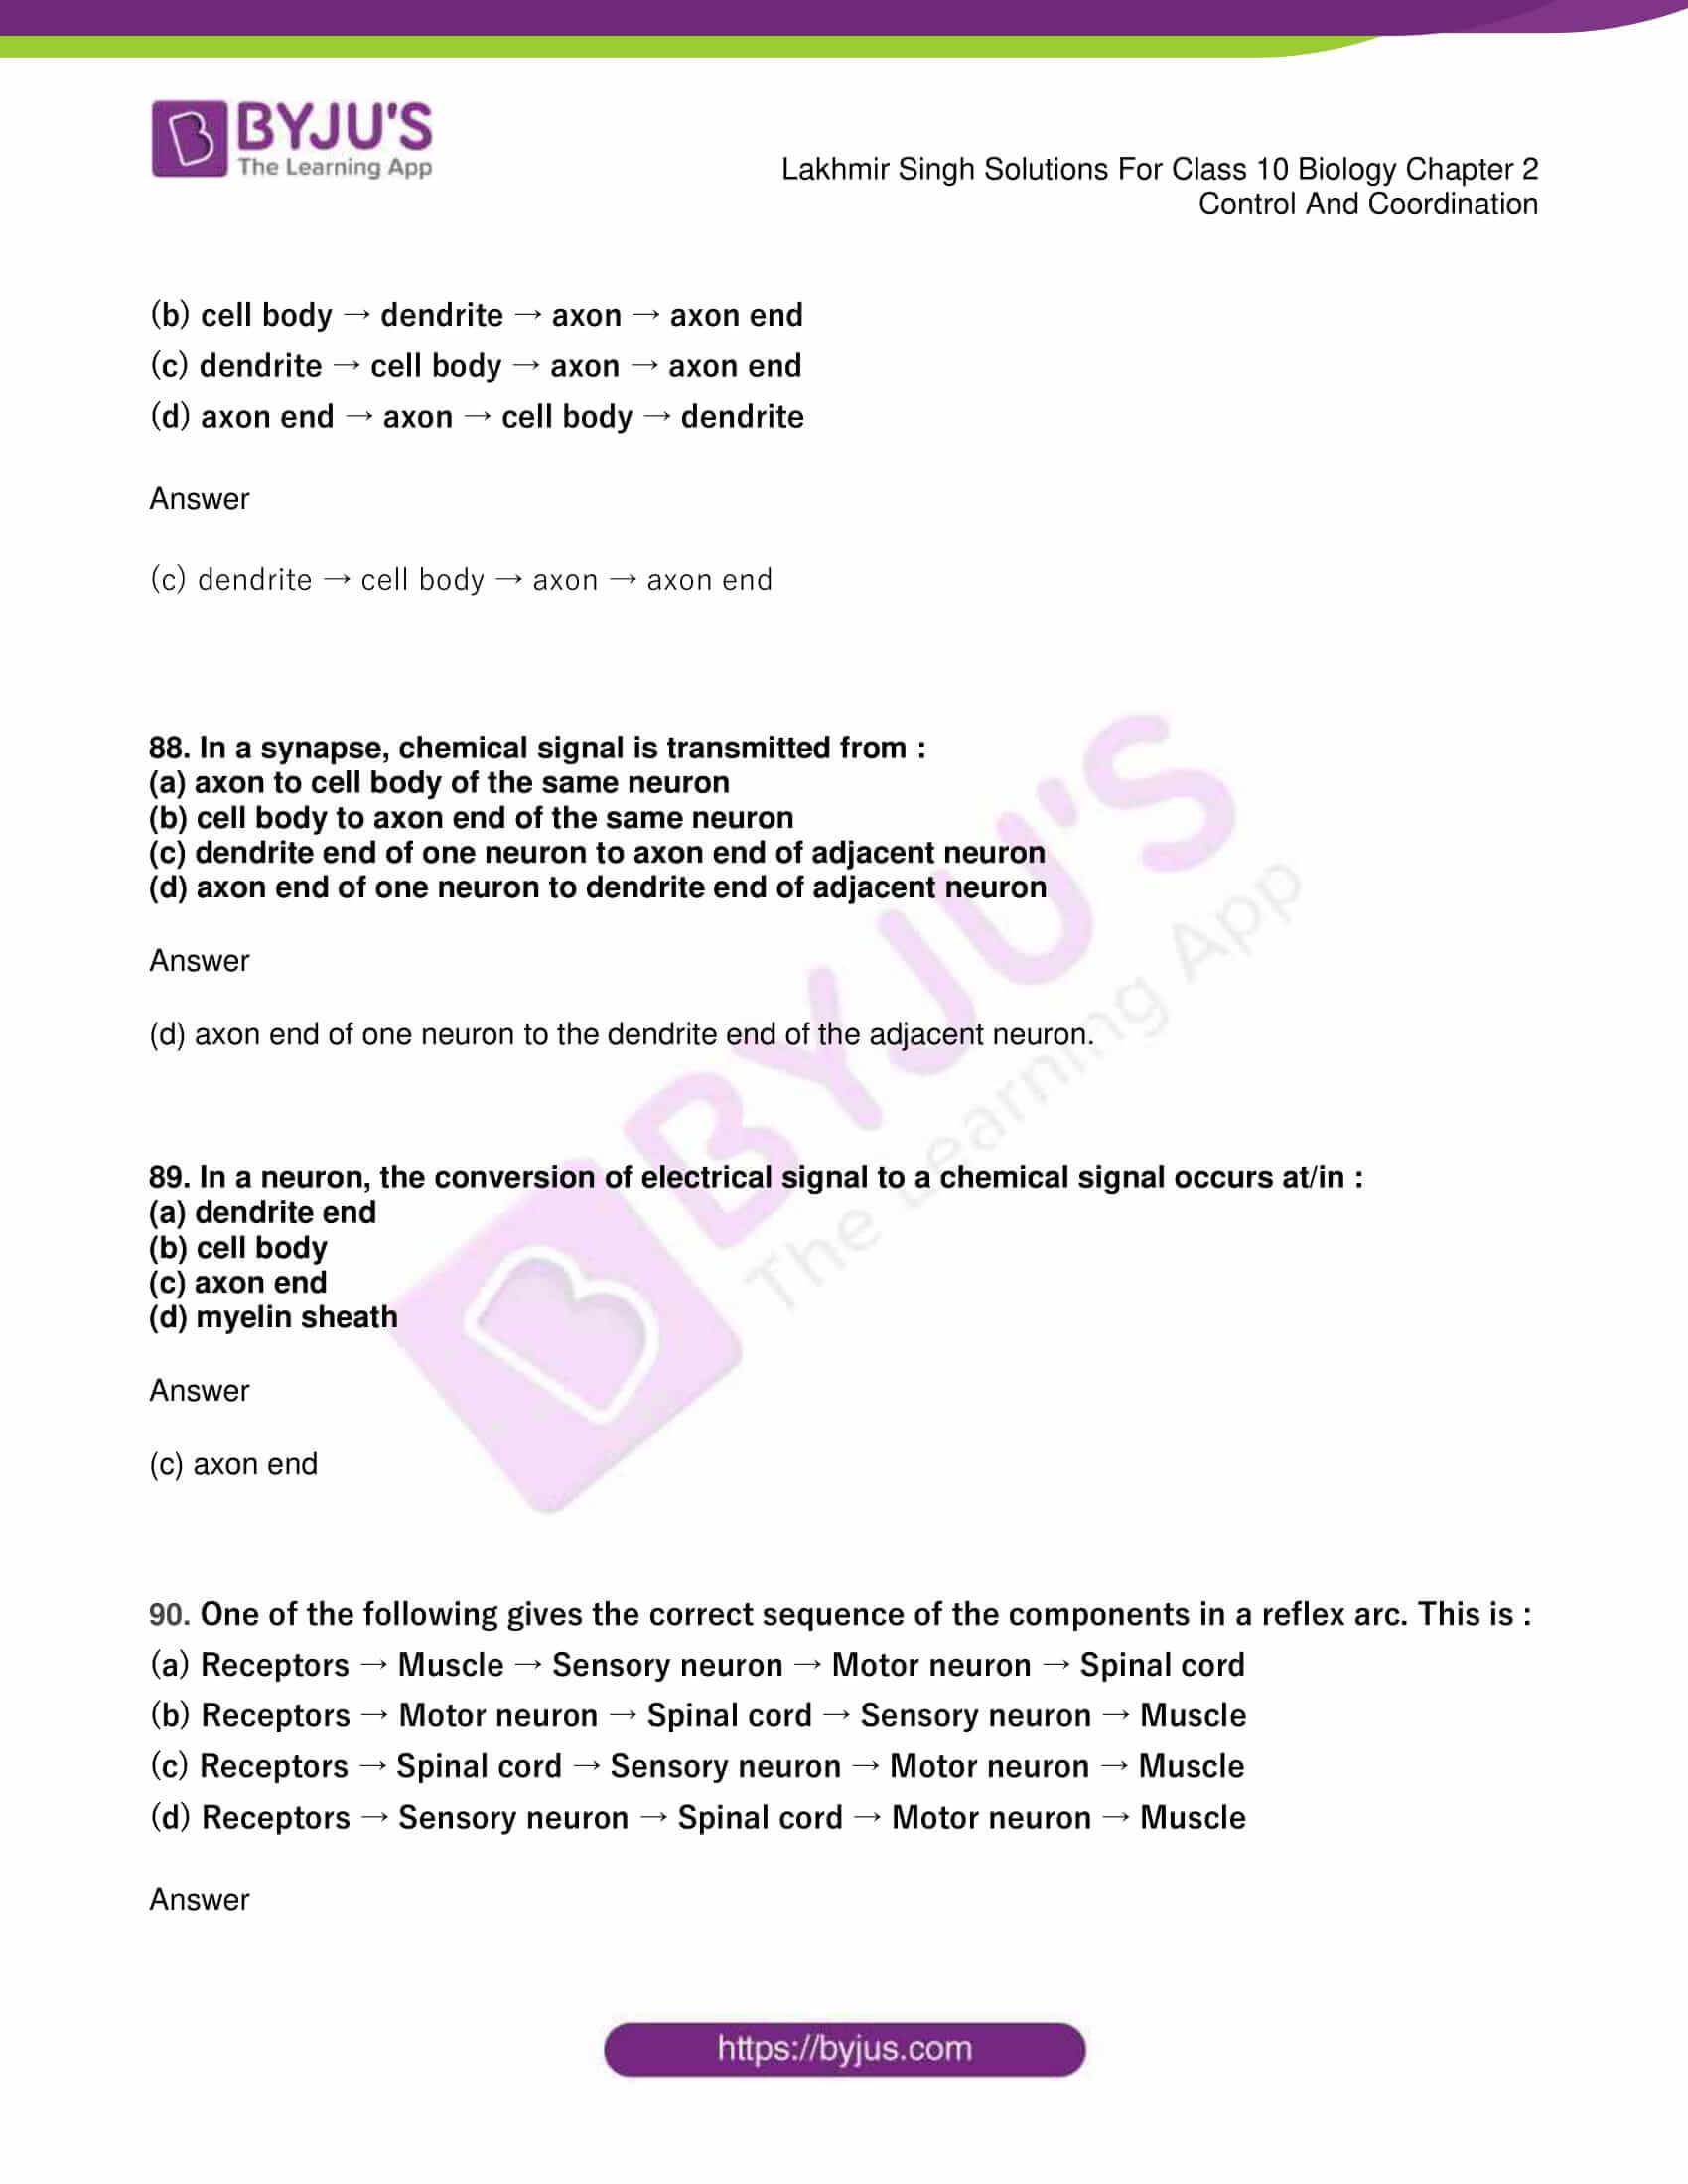 lakhmir singh sol class 10 biology chapter 2 49